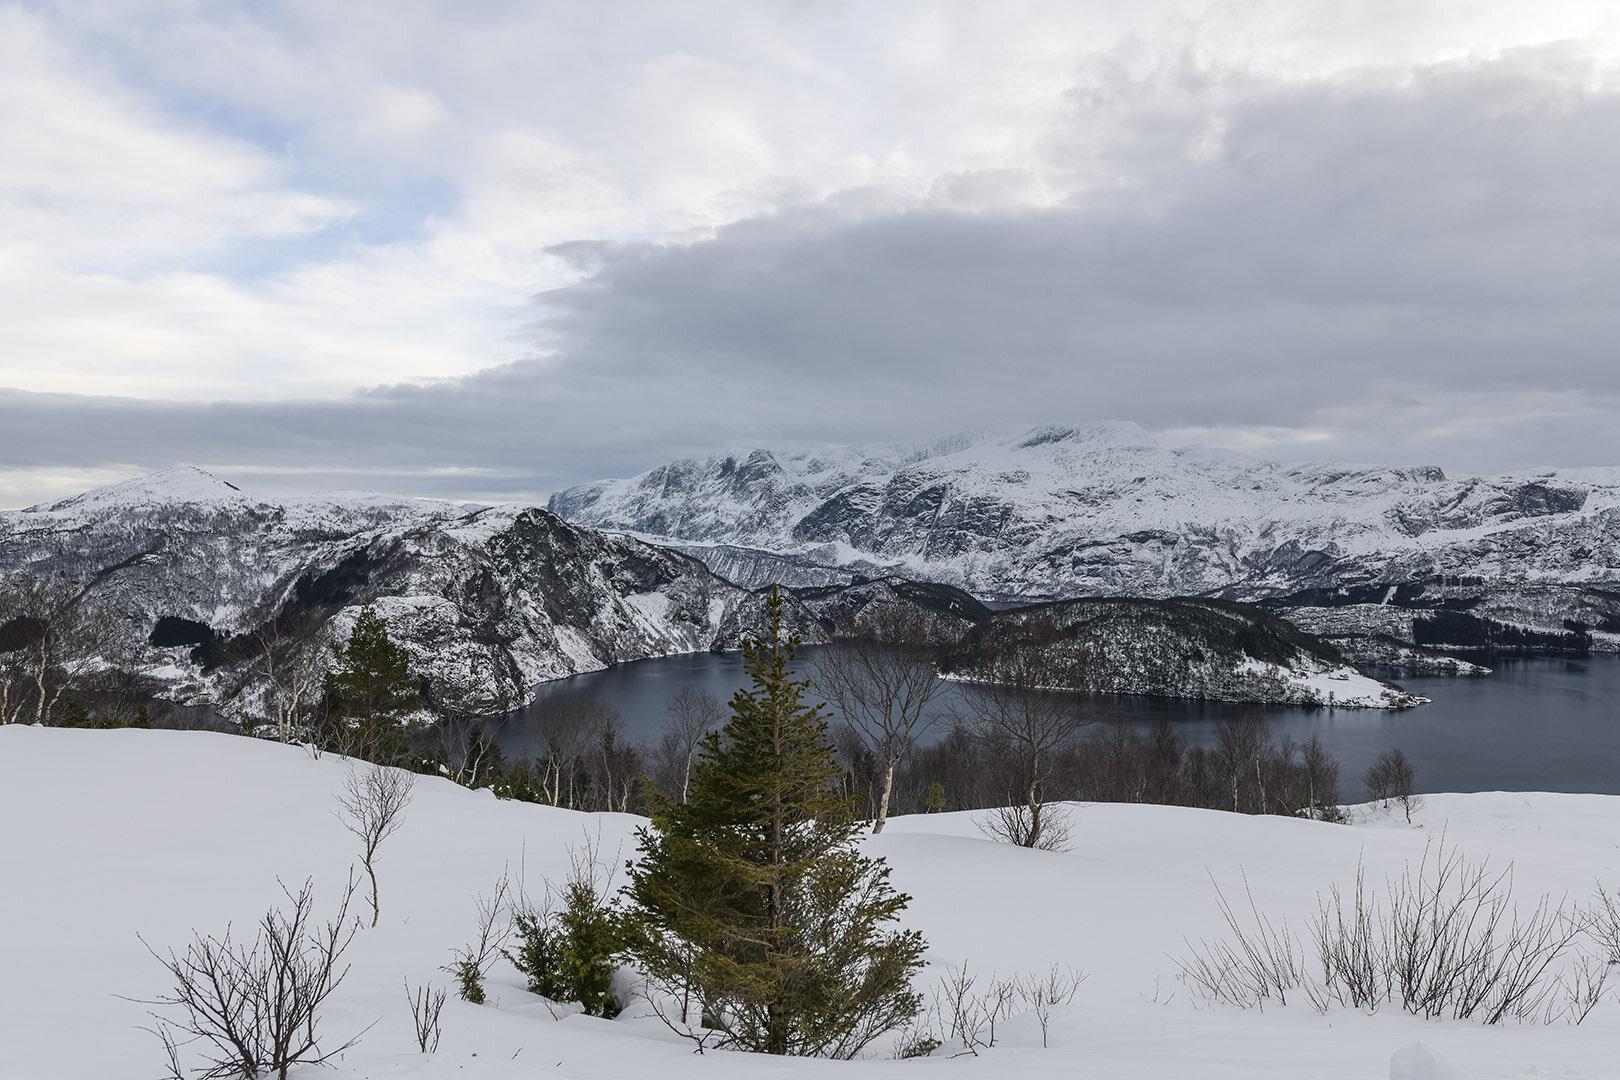 View from Engebøfjellet over an affected part of Førdefjorden.